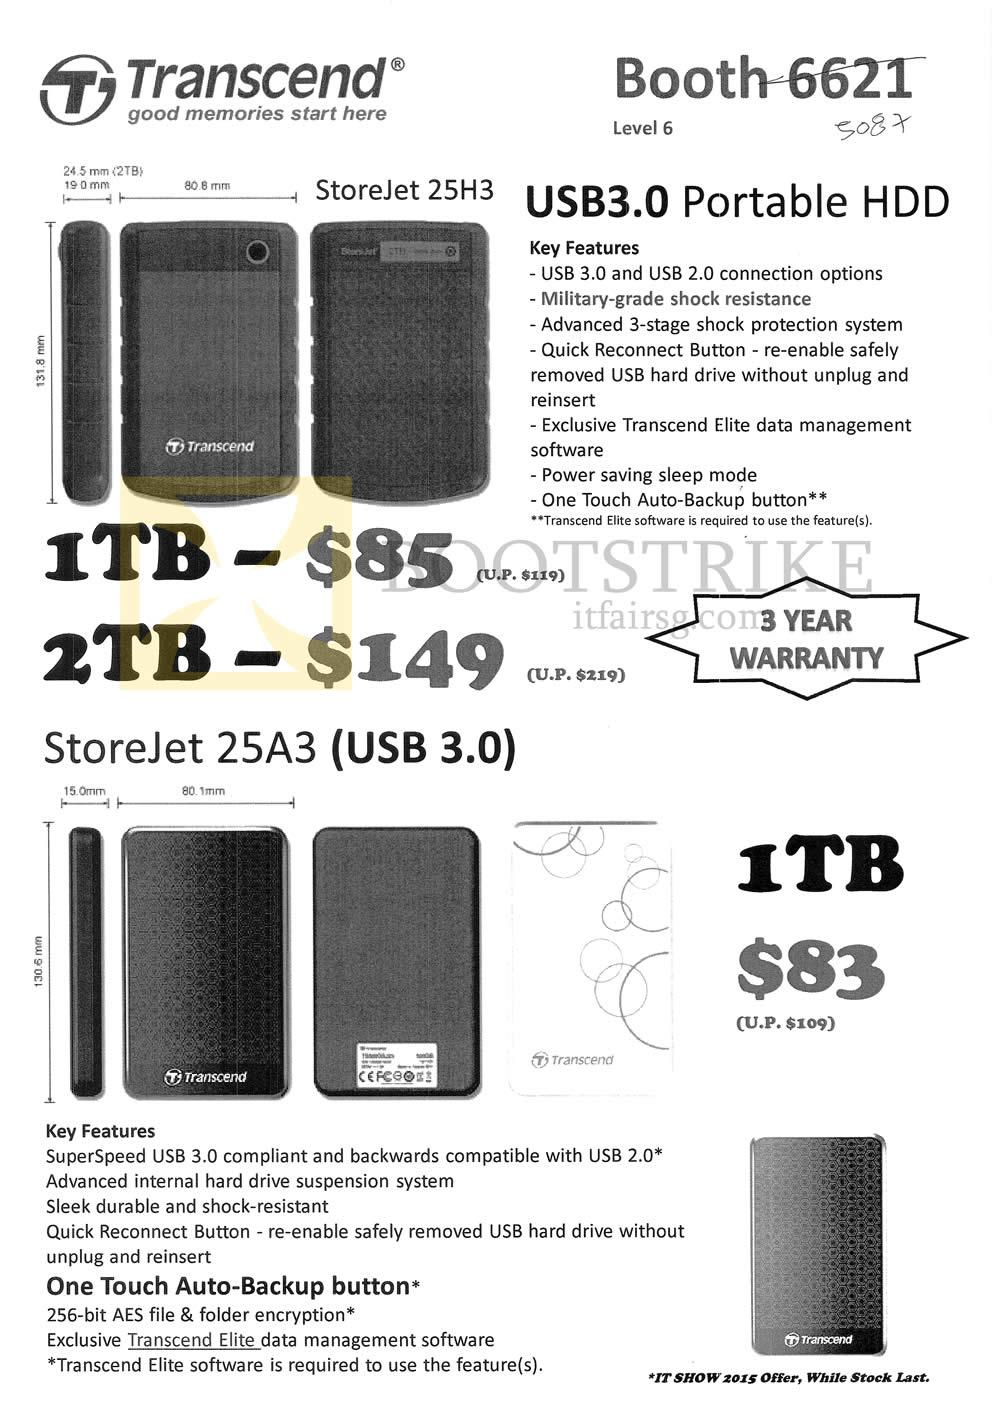 Transcend External Portable Drives Storejet 25h3 25a3 1tb Hardisk Eksternal 2 Tb Pc Show 2015 Price List Image Brochure Of